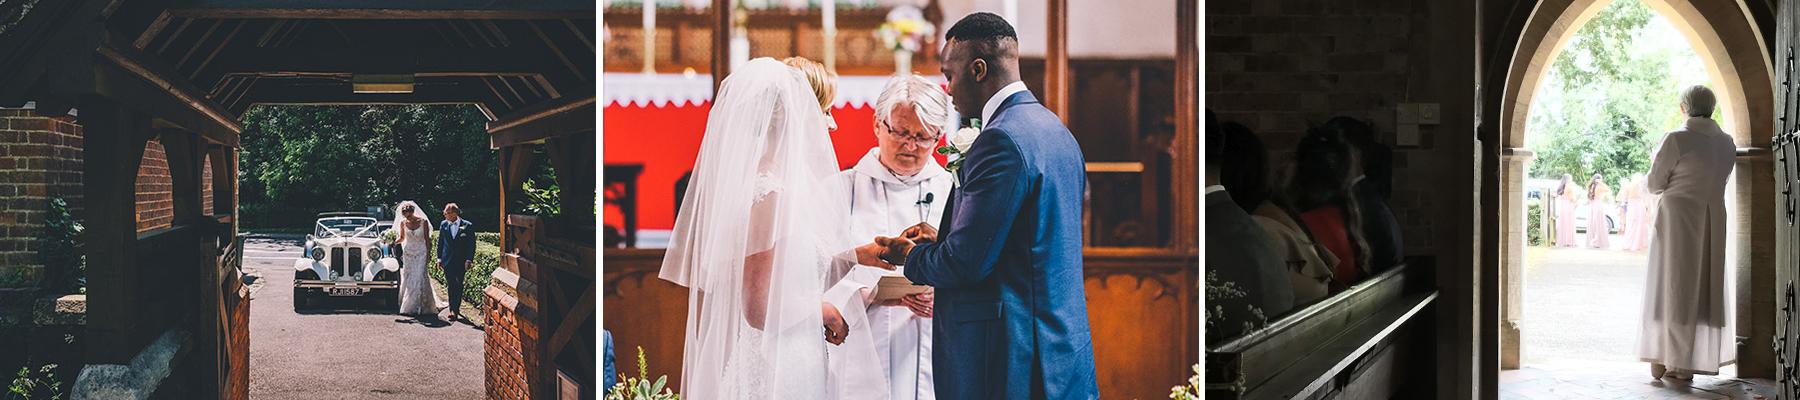 Weddings at Waddesdon Parish